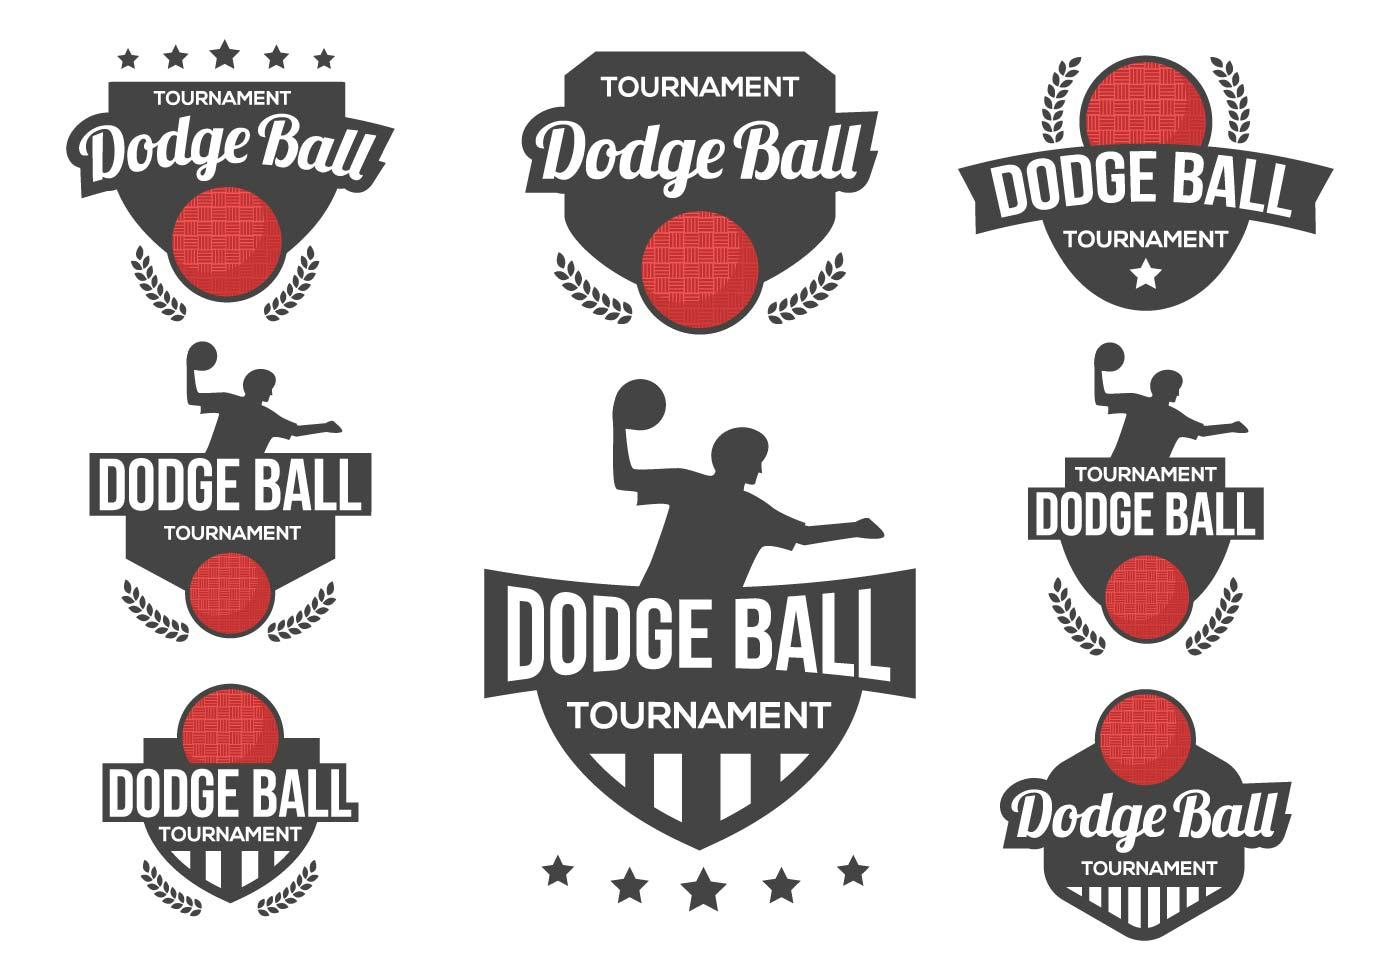 Free Dodge Ball Logo Vector - Download Free Vector Art, Stock Graphics ...